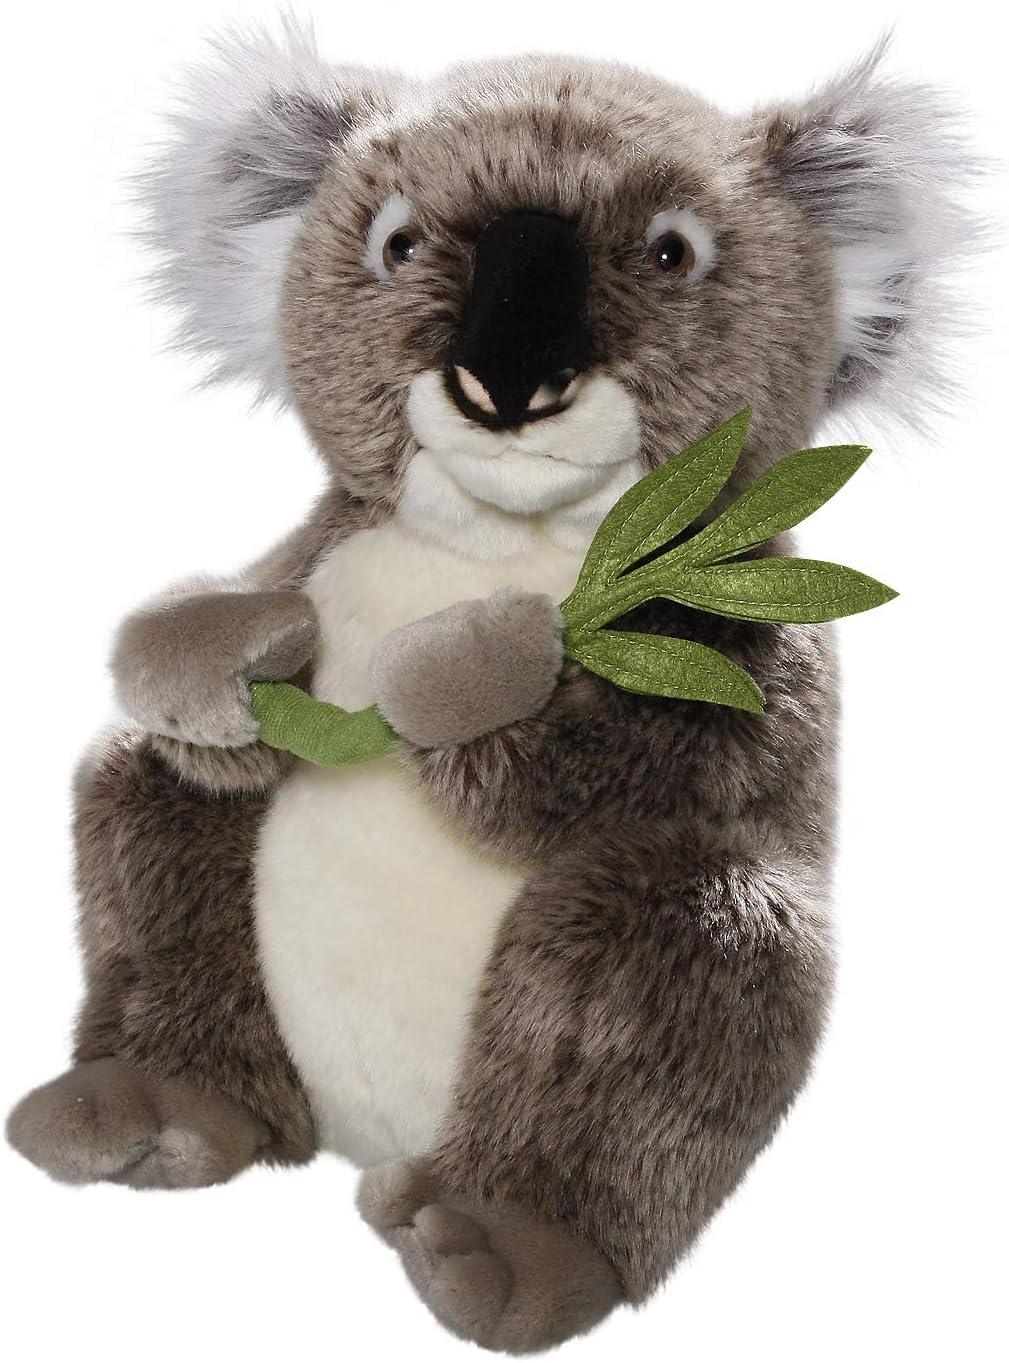 Carl Dick Peluche - Oso de Koala con la Hoja (Felpa, 30cm) [Juguete] 2890